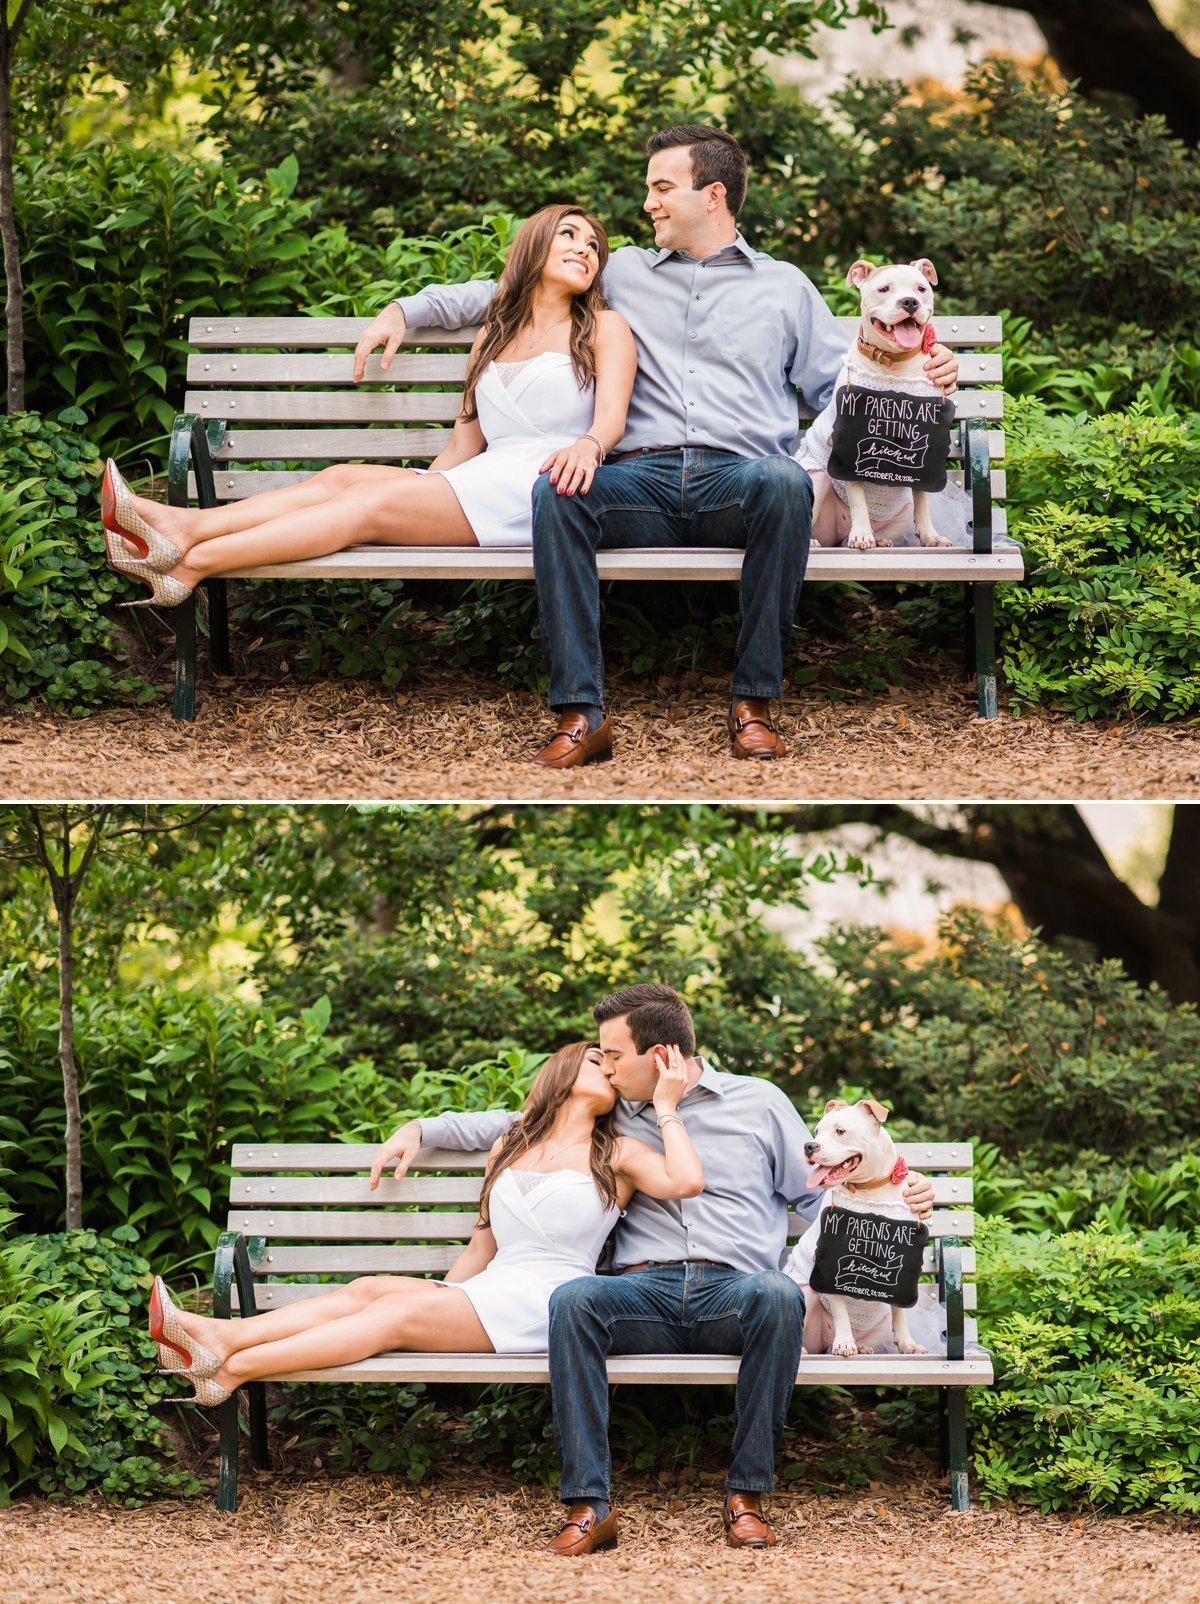 Brenda & Marco Engagement Blog 6